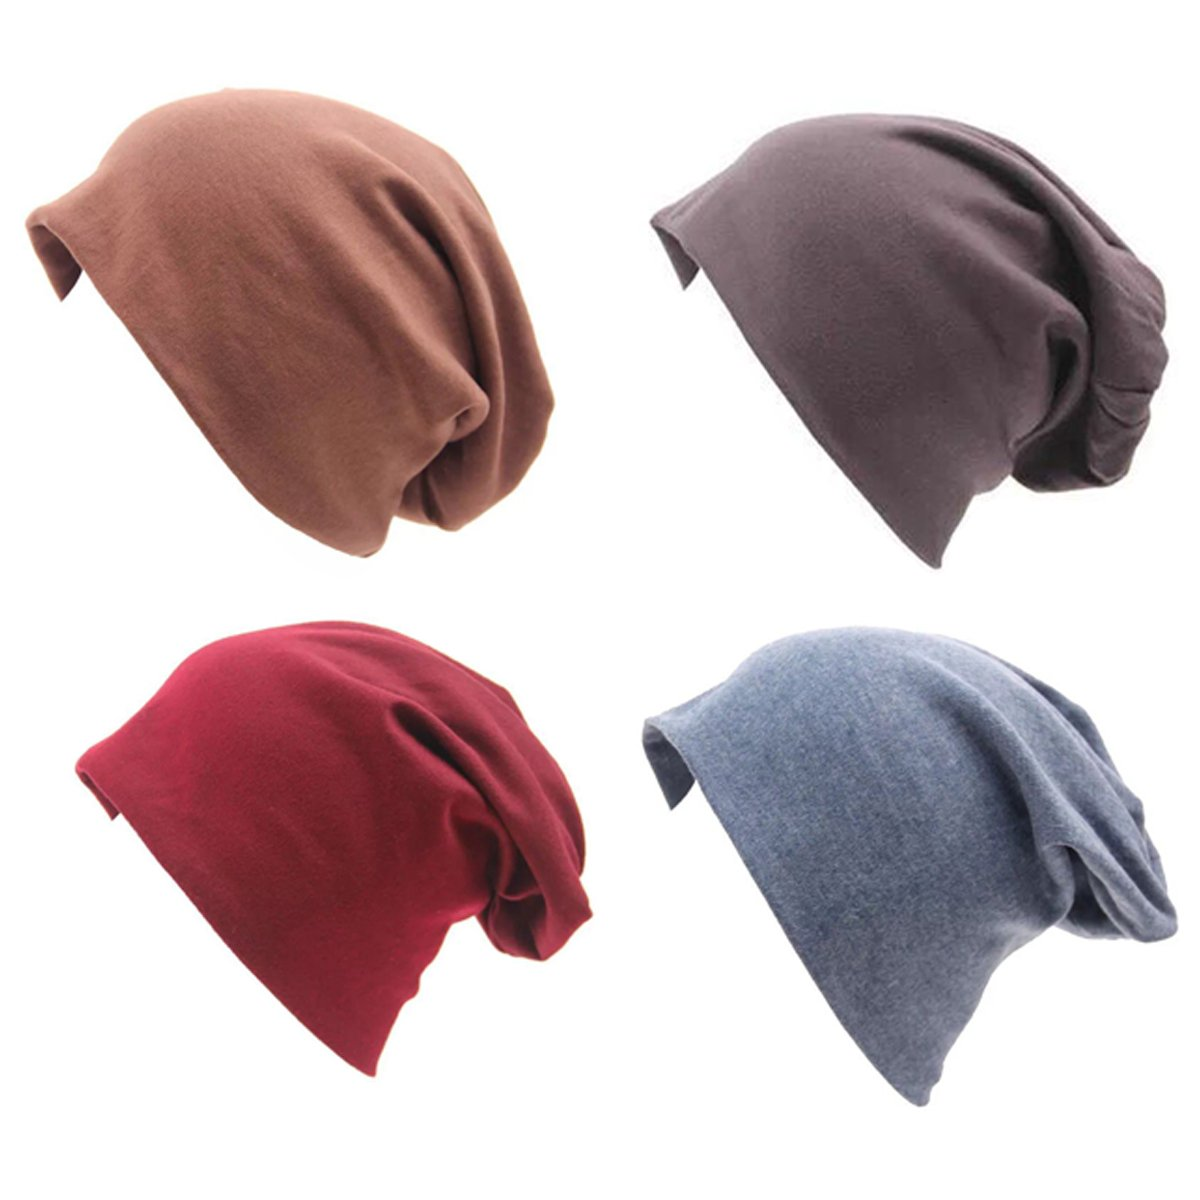 JOYEBUY 4 Pack Women Men Stylish Cotton Beanie Cap Slouchy Beanies Hats Soft Sleep Cap (Style D)